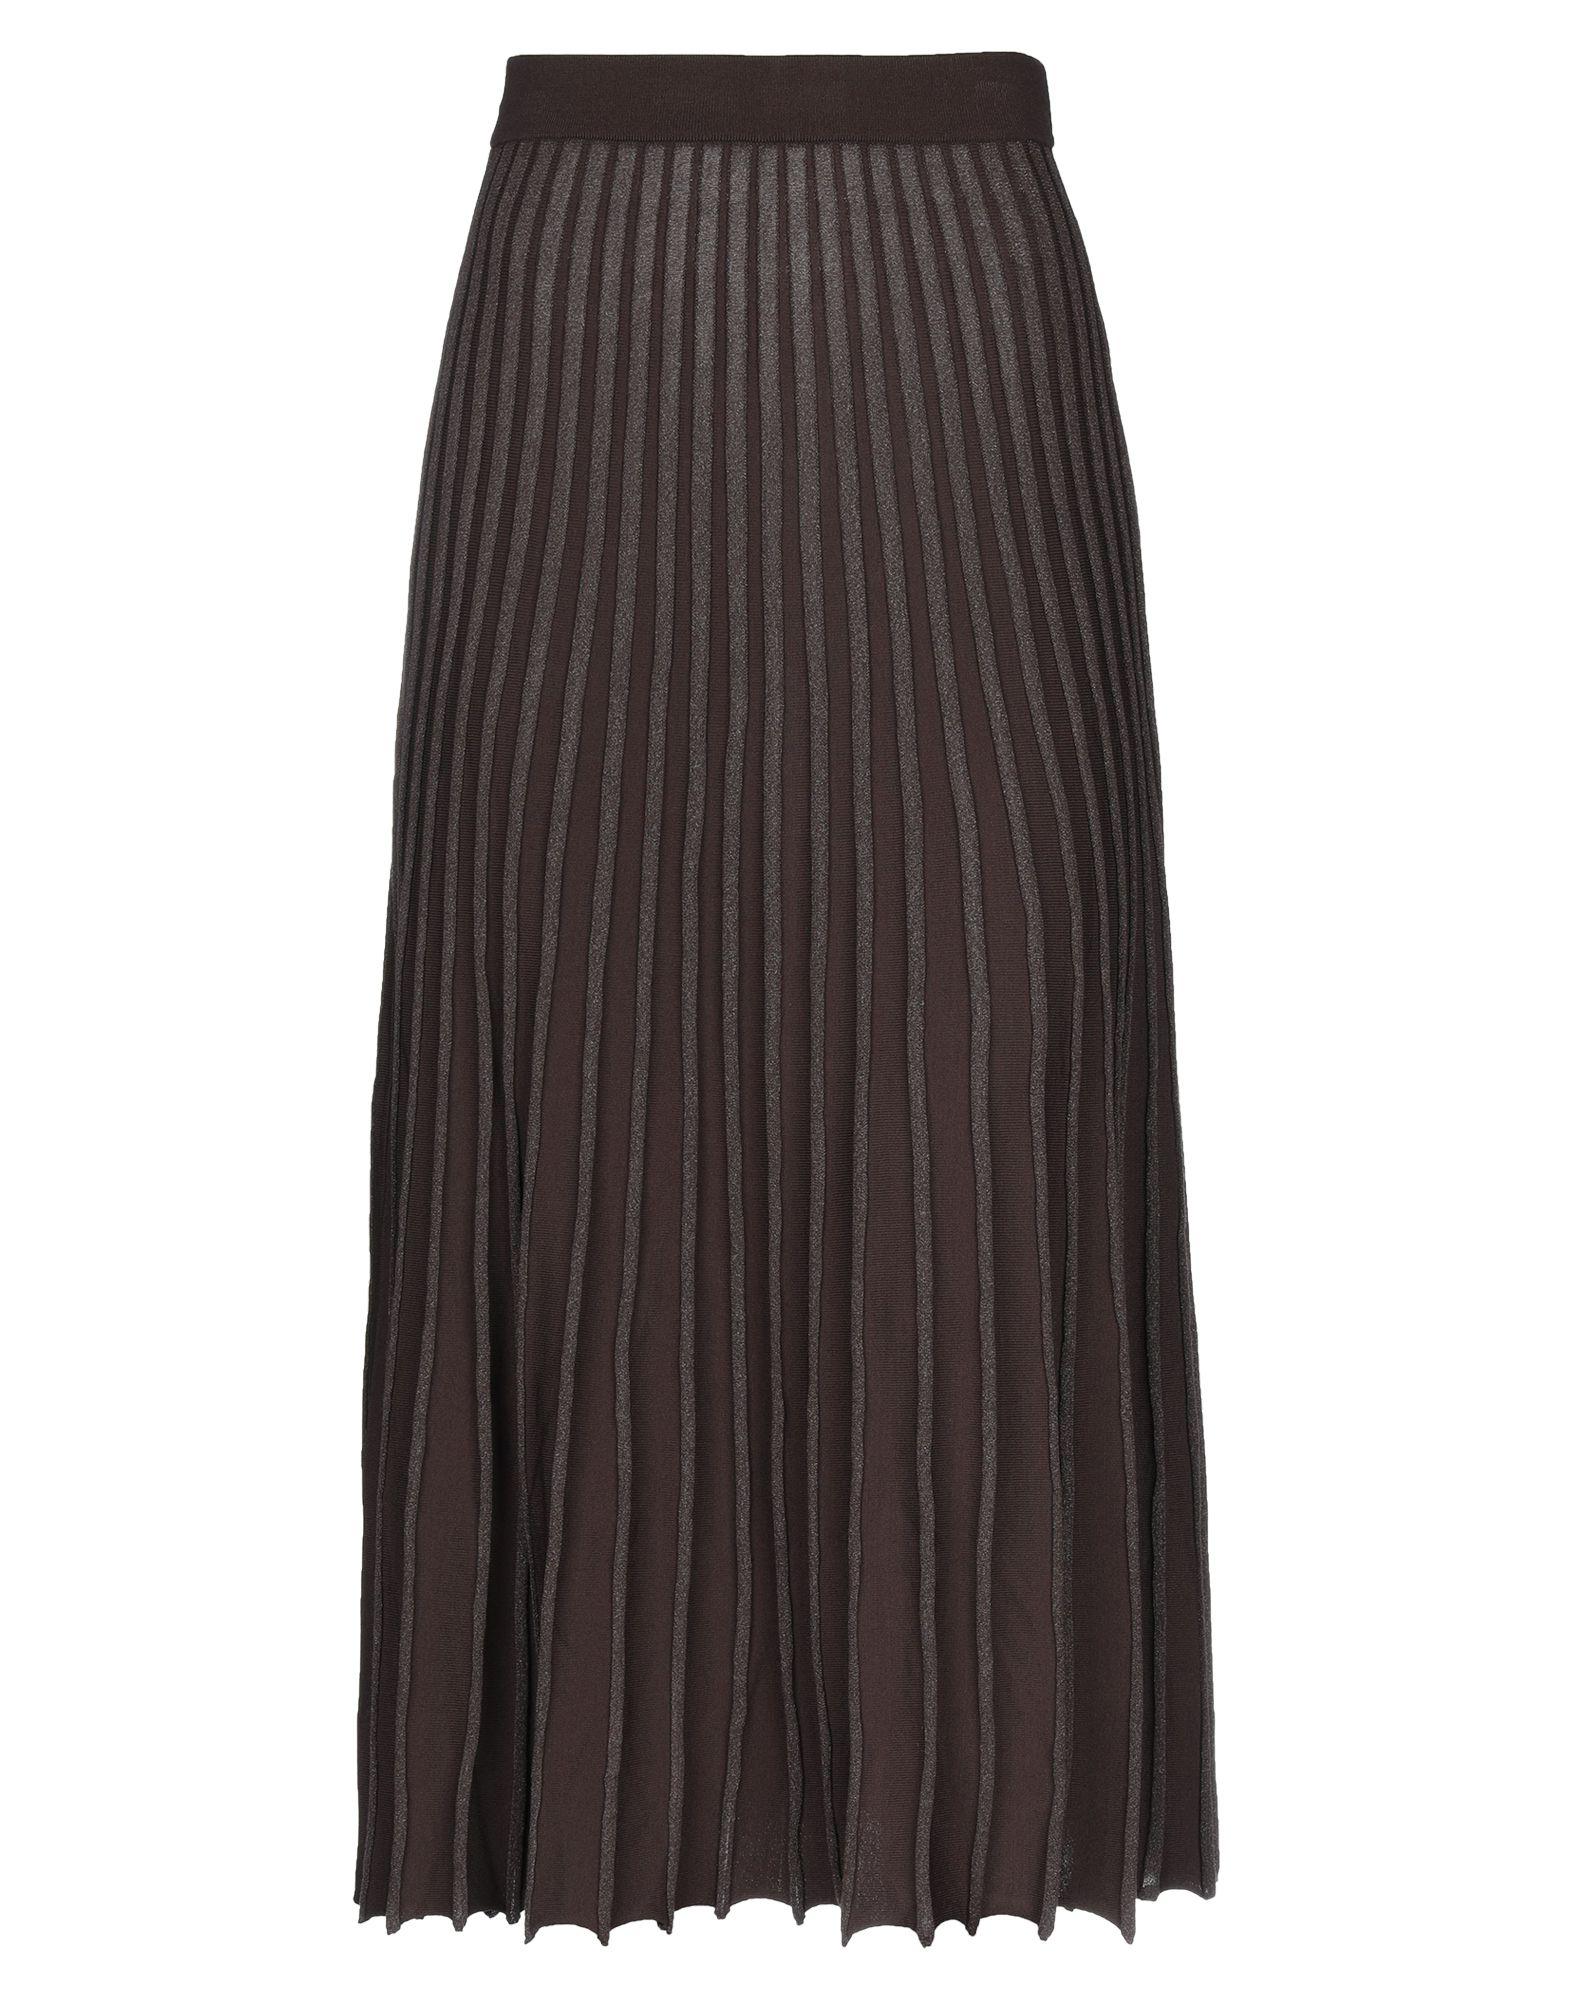 ALPHA STUDIO Юбка длиной 3/4 юбка clever woman studio